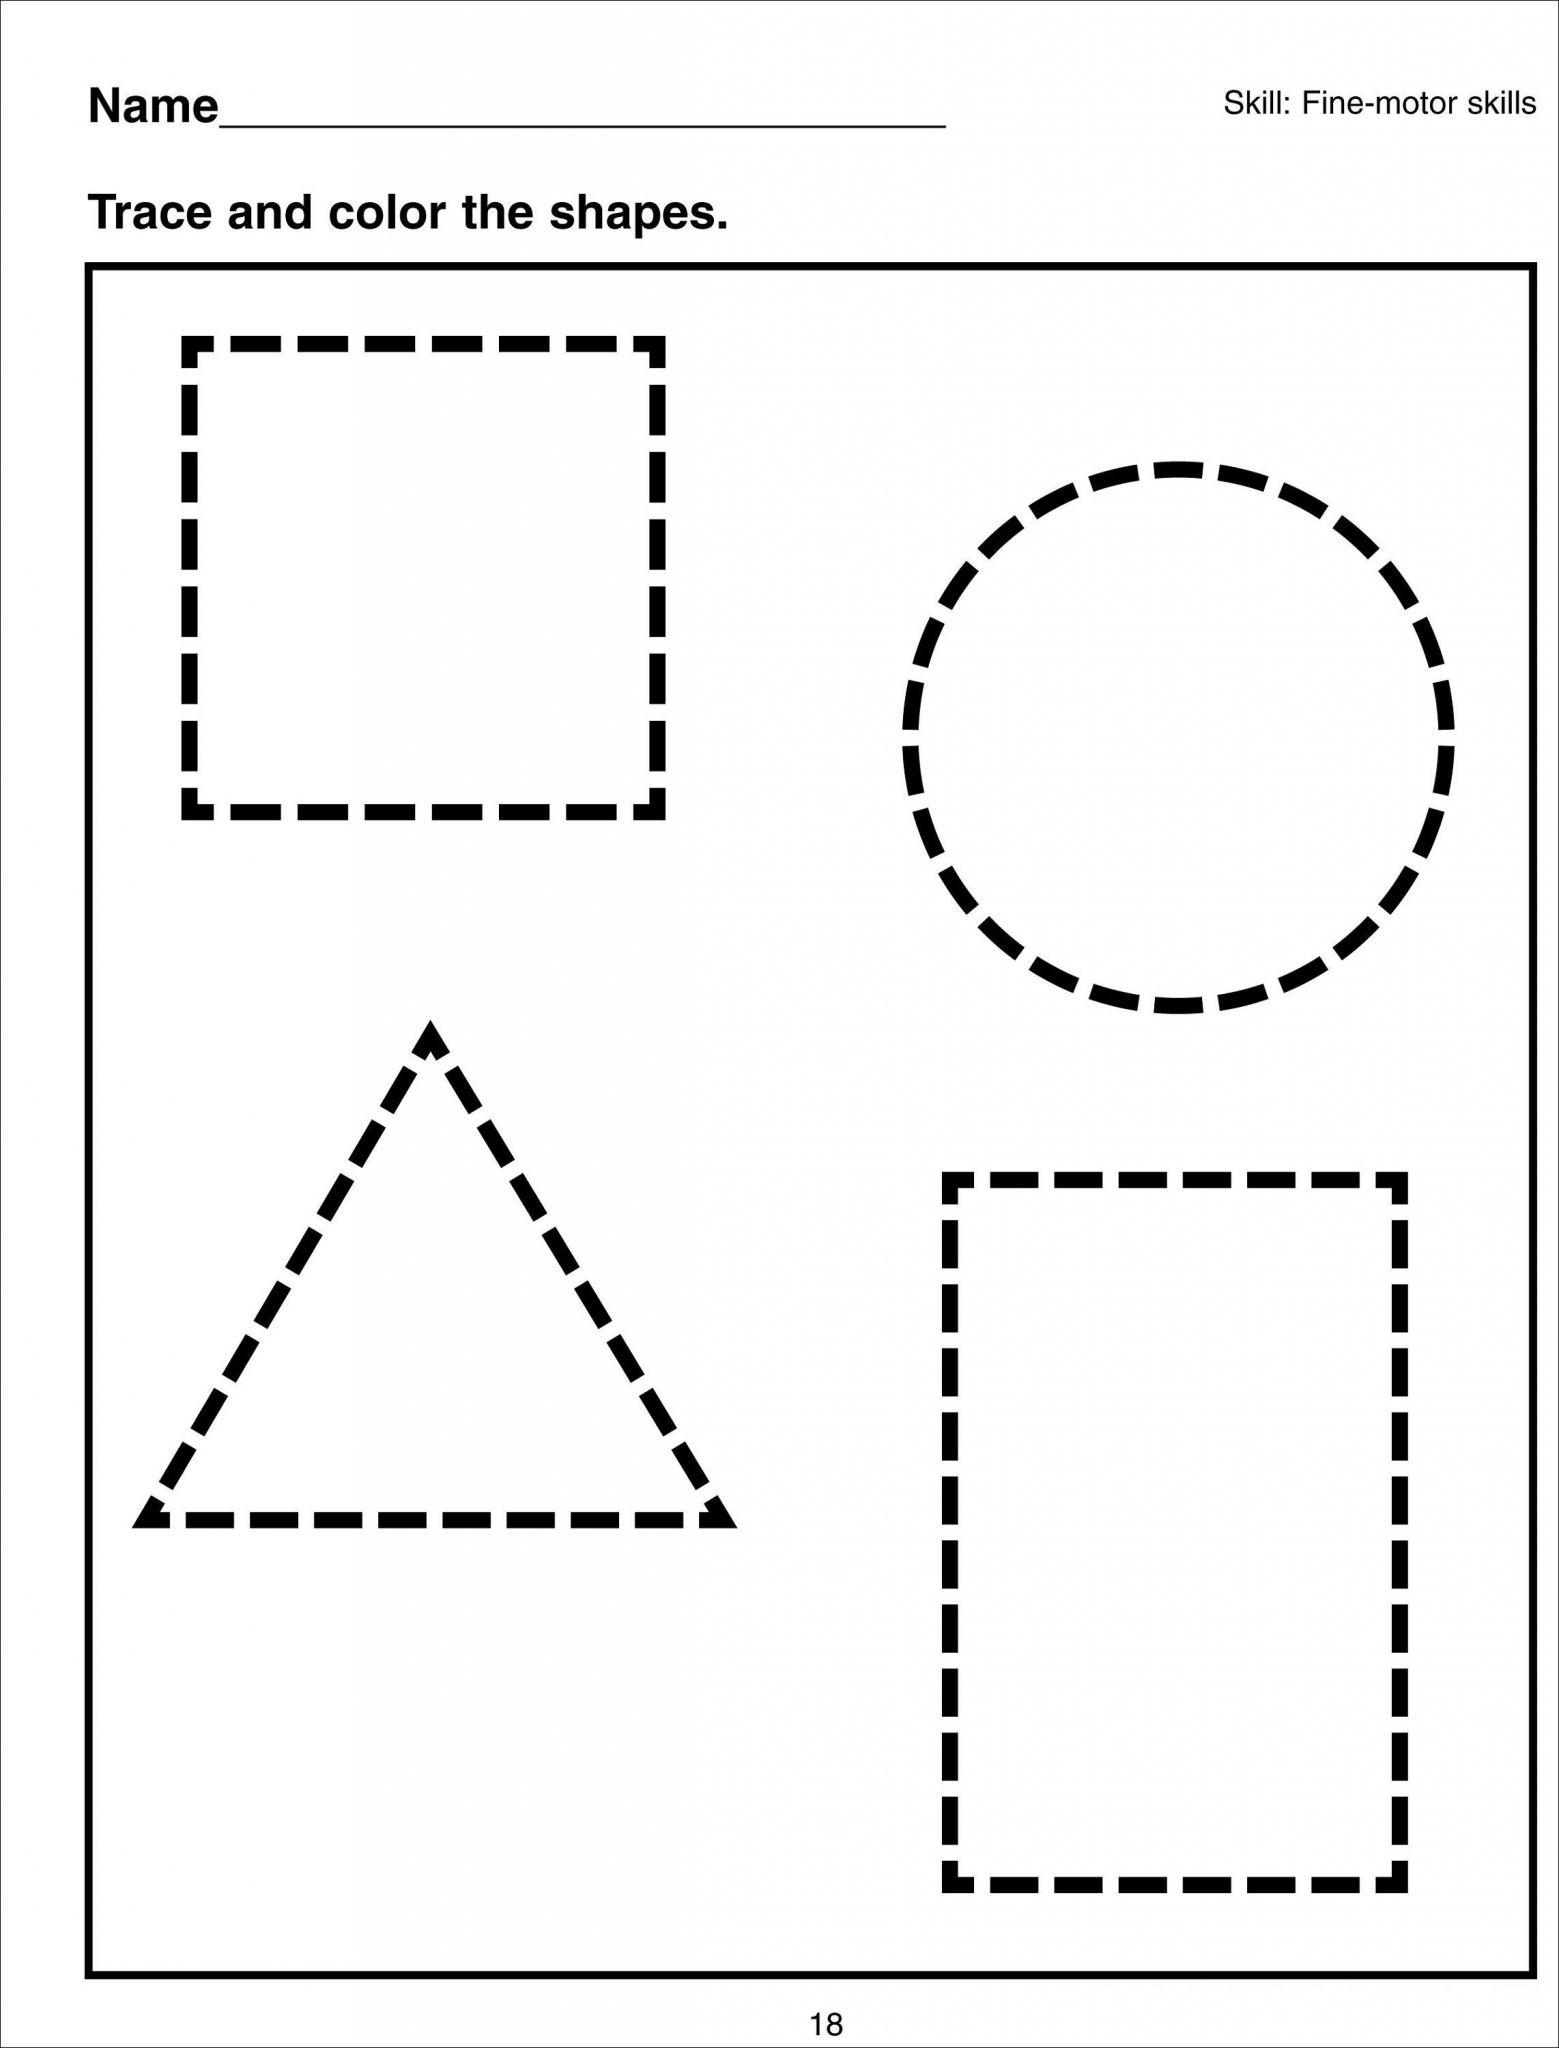 Cursive Name Worksheet Generator | Briefencounters | A To Z Teacher Stuff Tools Printable Handwriting Worksheet Generator